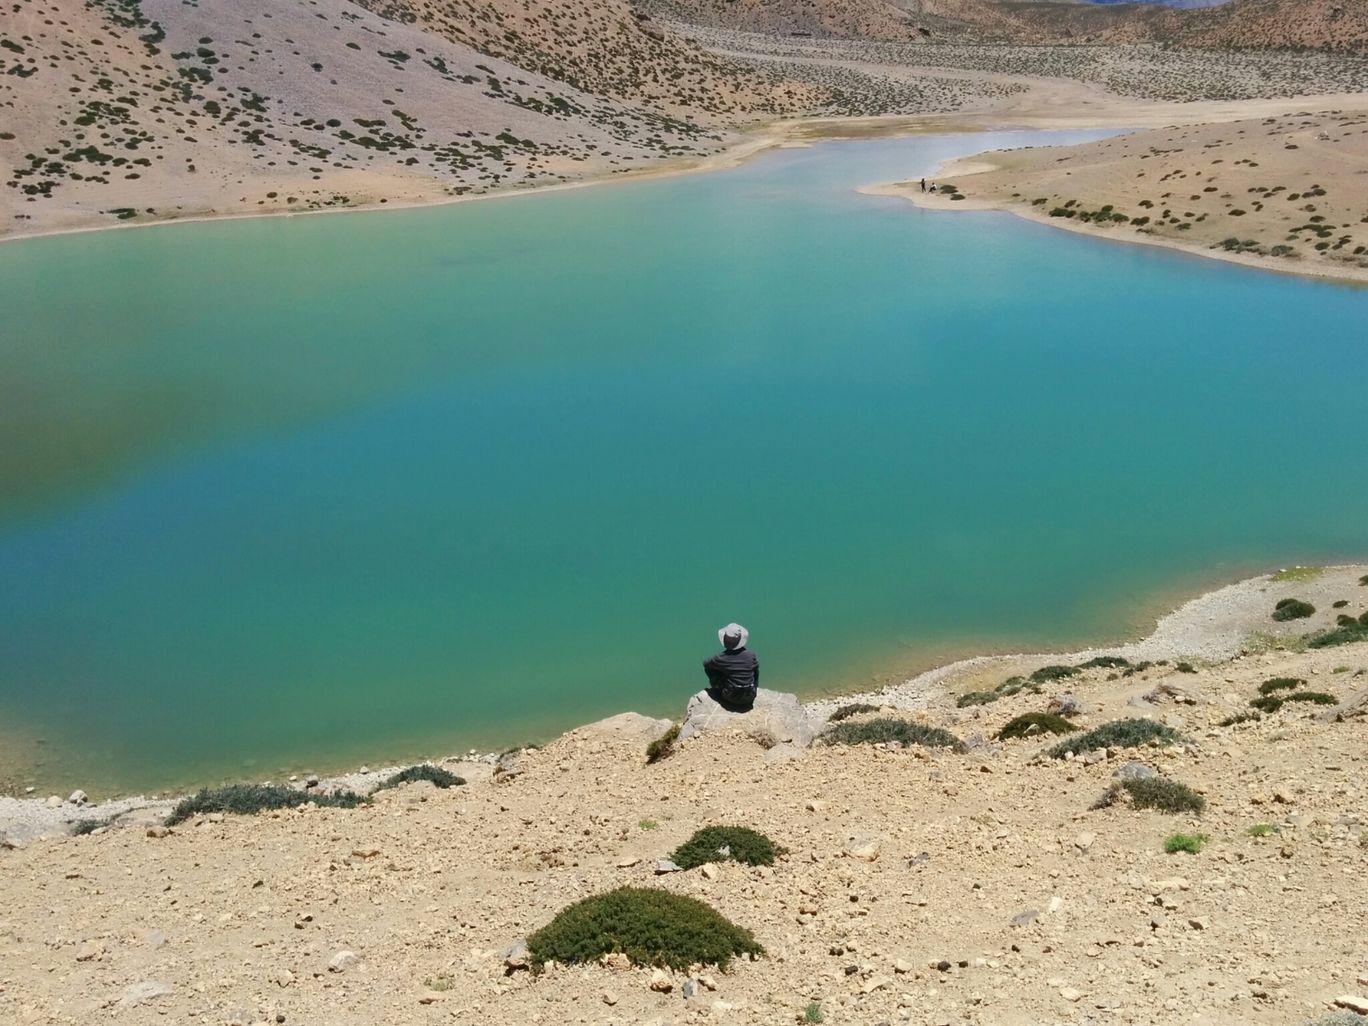 Photo of Dhankar Lake By Lakshya pawa